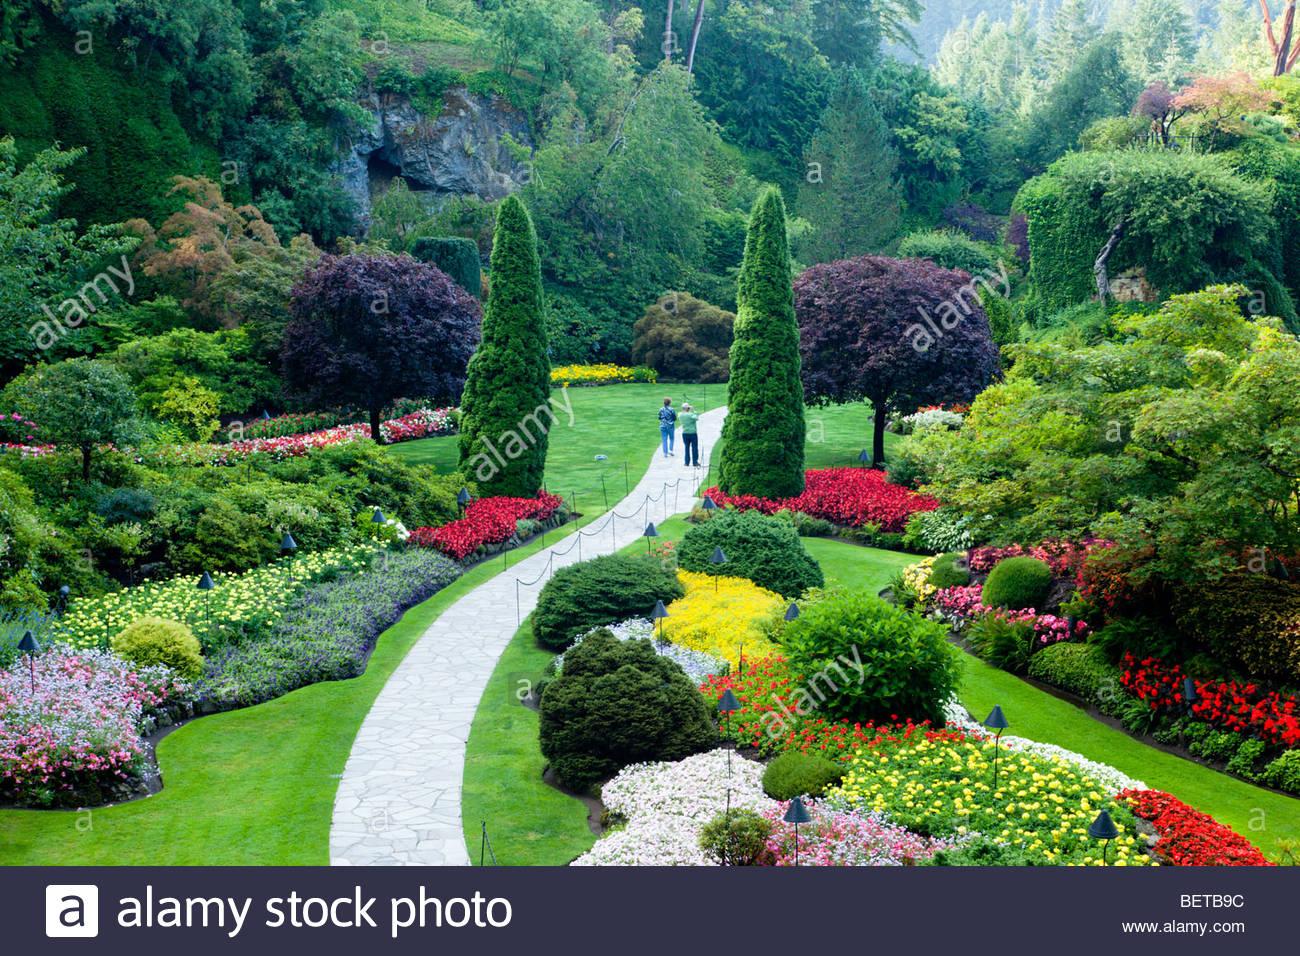 Sunken Garden at the Butchart Gardens, Brentwood Bay, Vancouver Island, B.C. - Stock Image